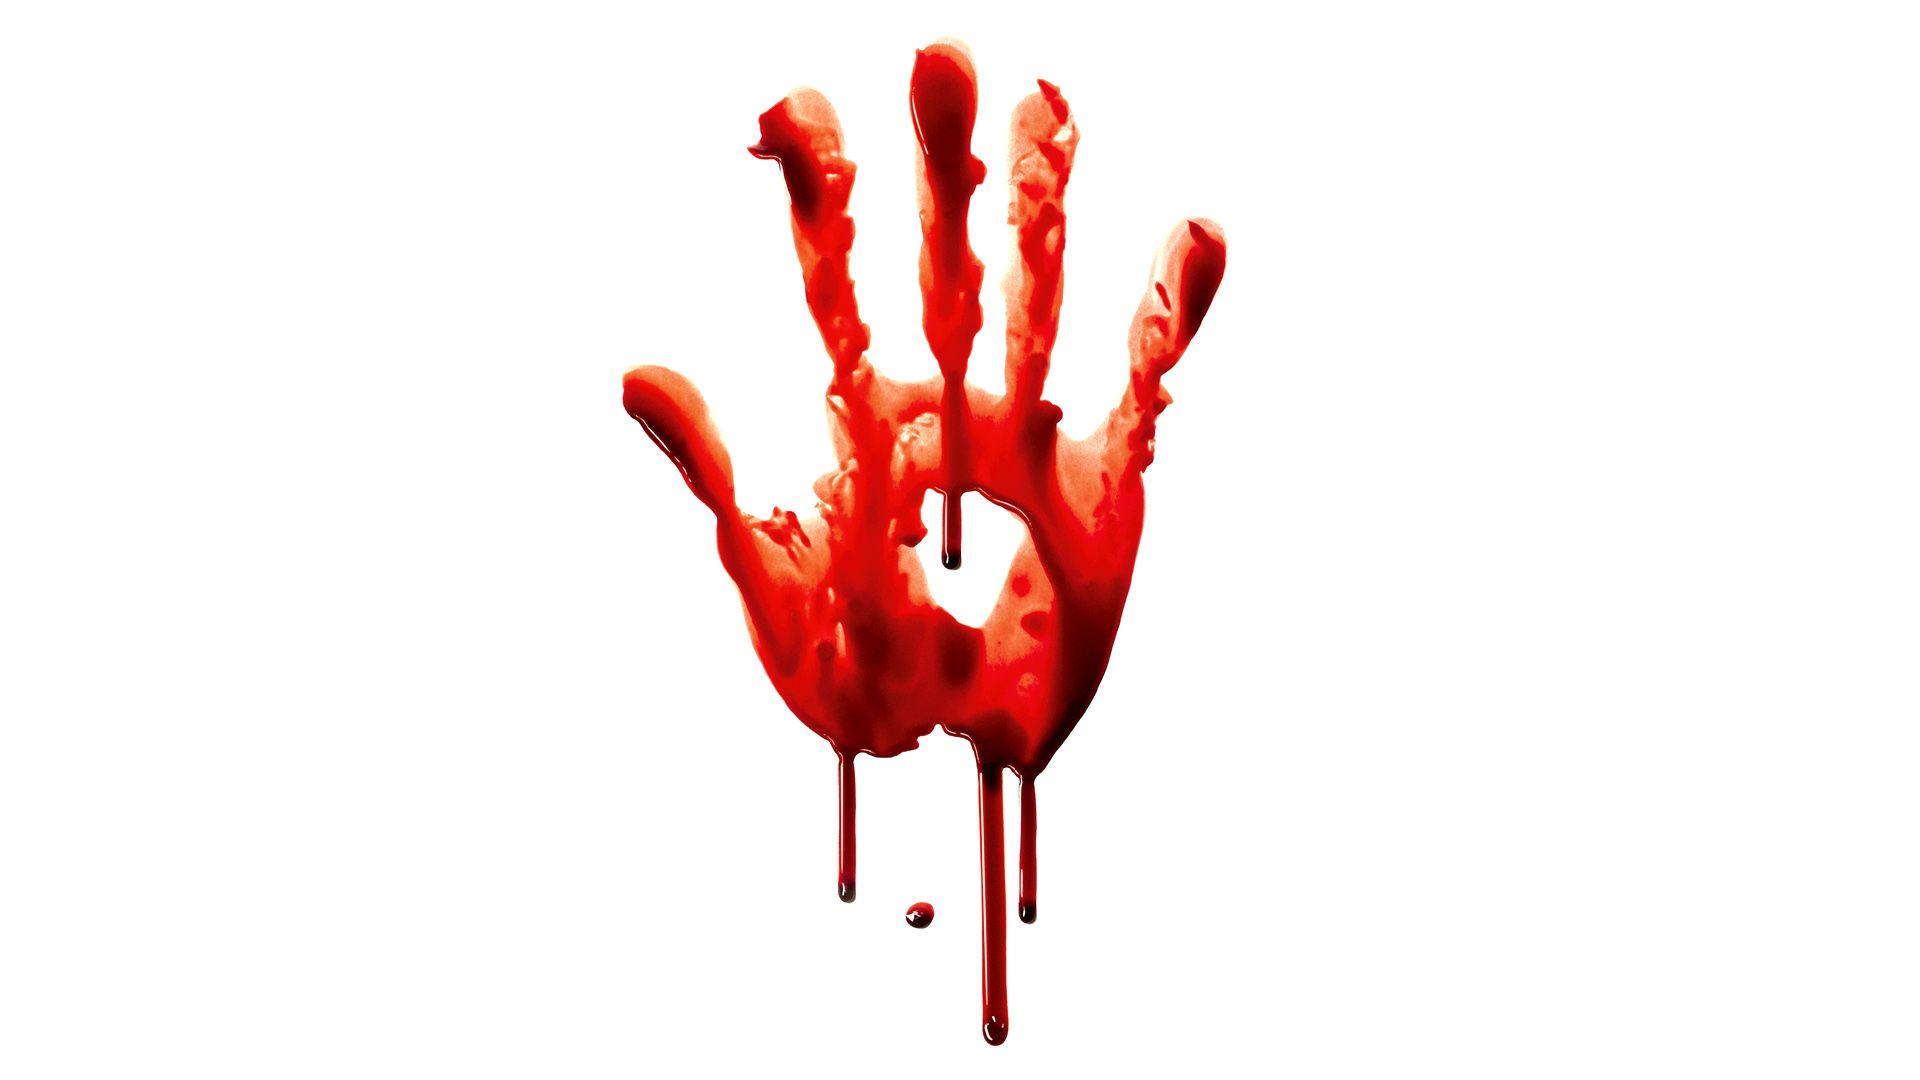 Blood HD Wallpapers Backgrounds Wallpaper True blood